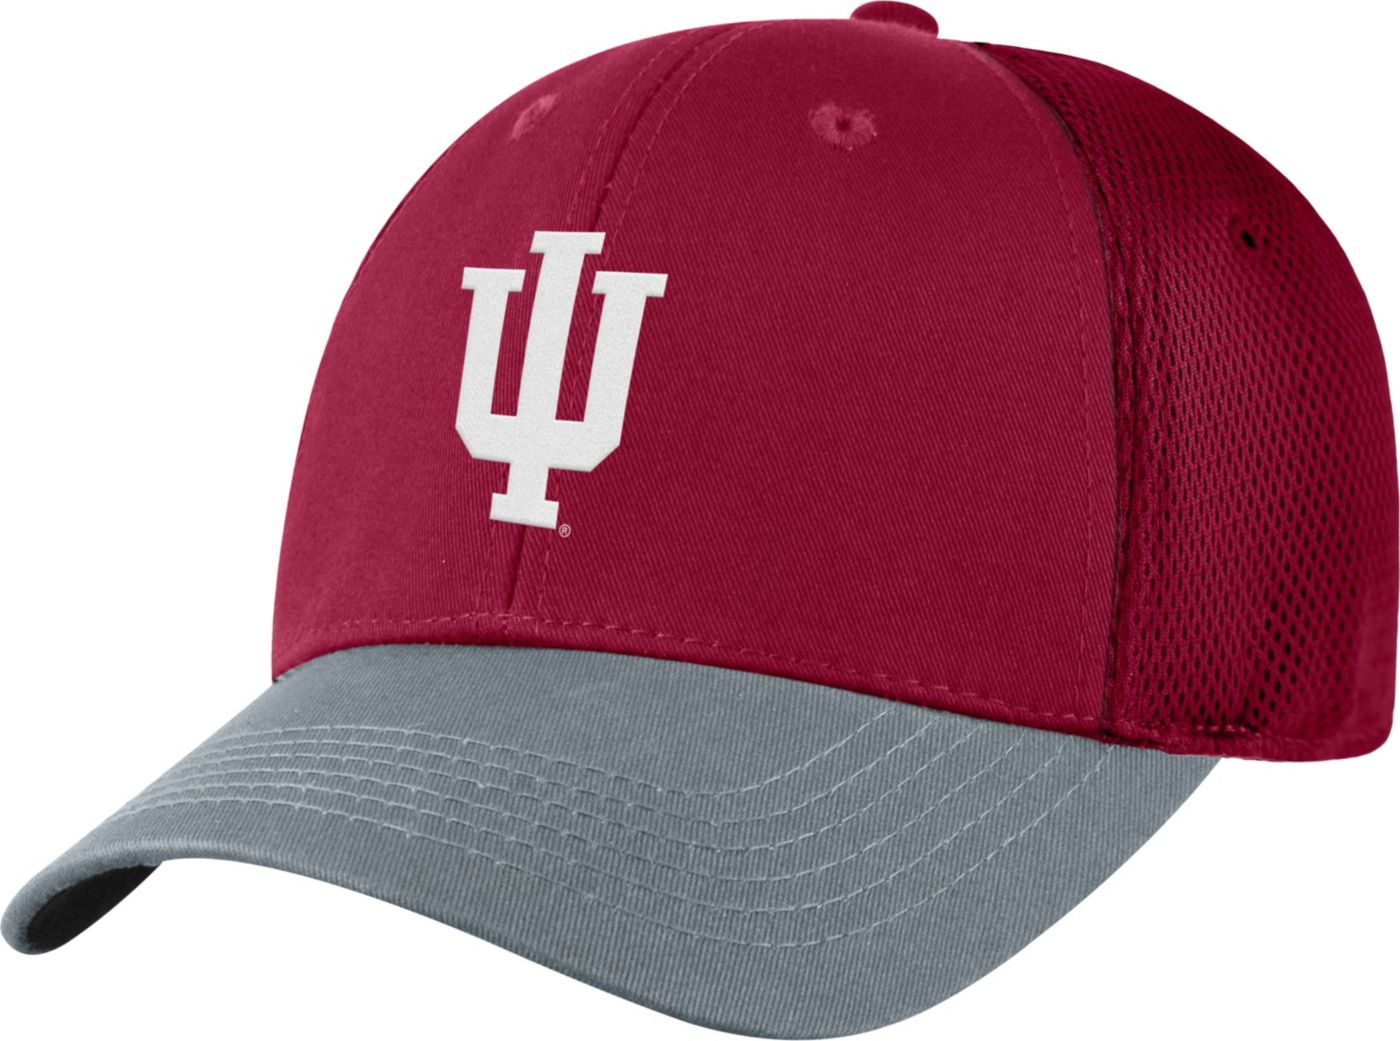 Top of the World Men's Indiana Hoosiers Crimson Twill Elite Mesh 1Fit Flex Hat